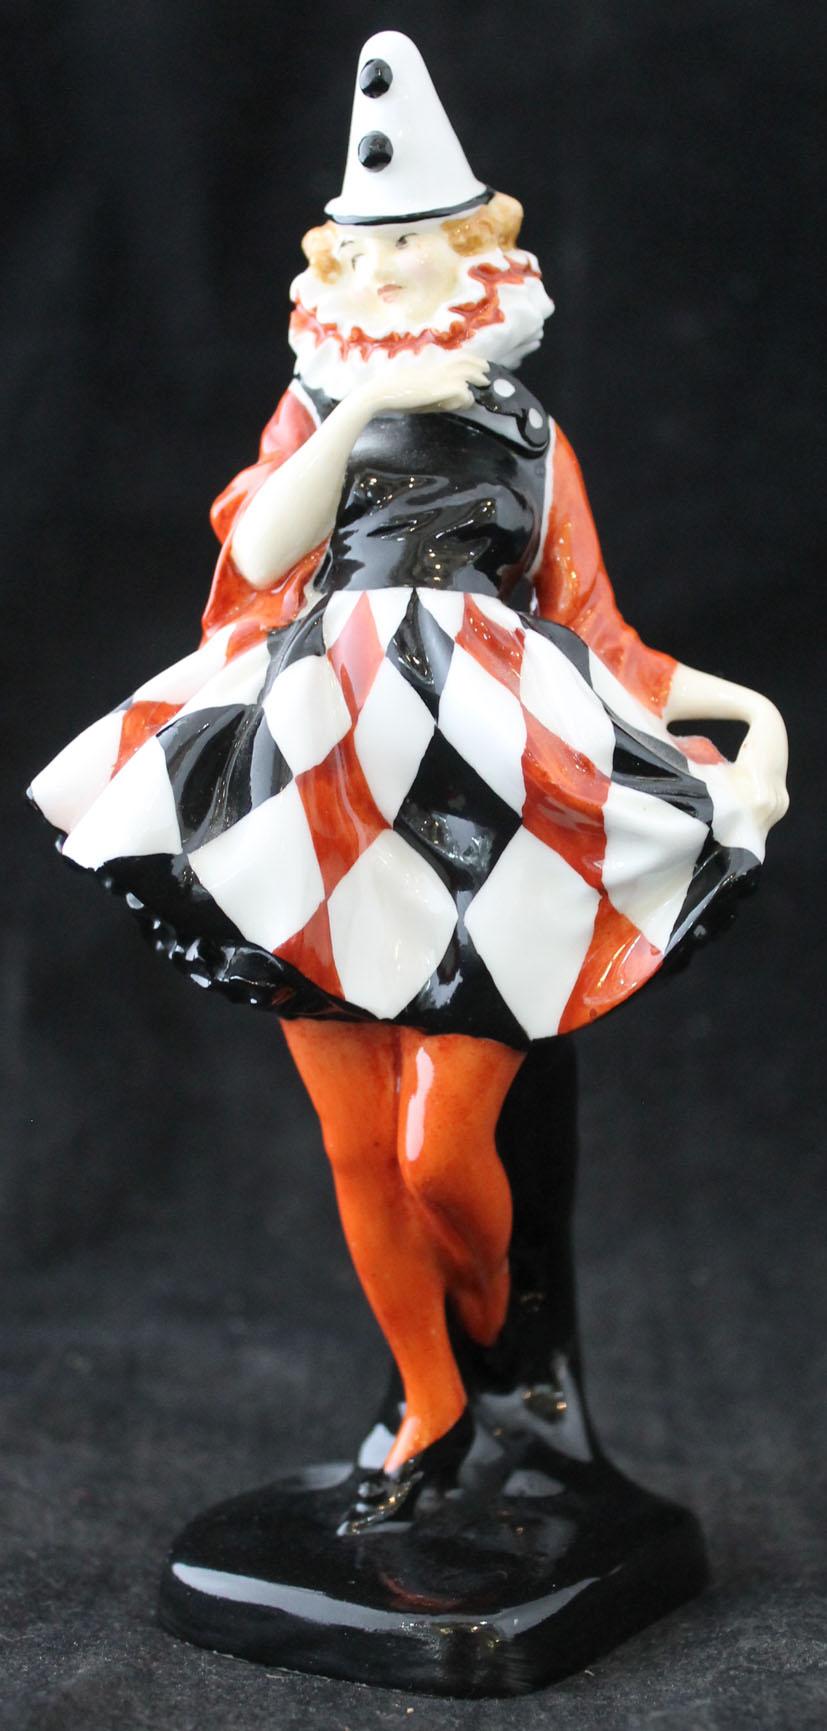 Lot 320 - A Royal Doulton figure 'Pierrette' HN643, designed by Leslie Harradine, green printed factory